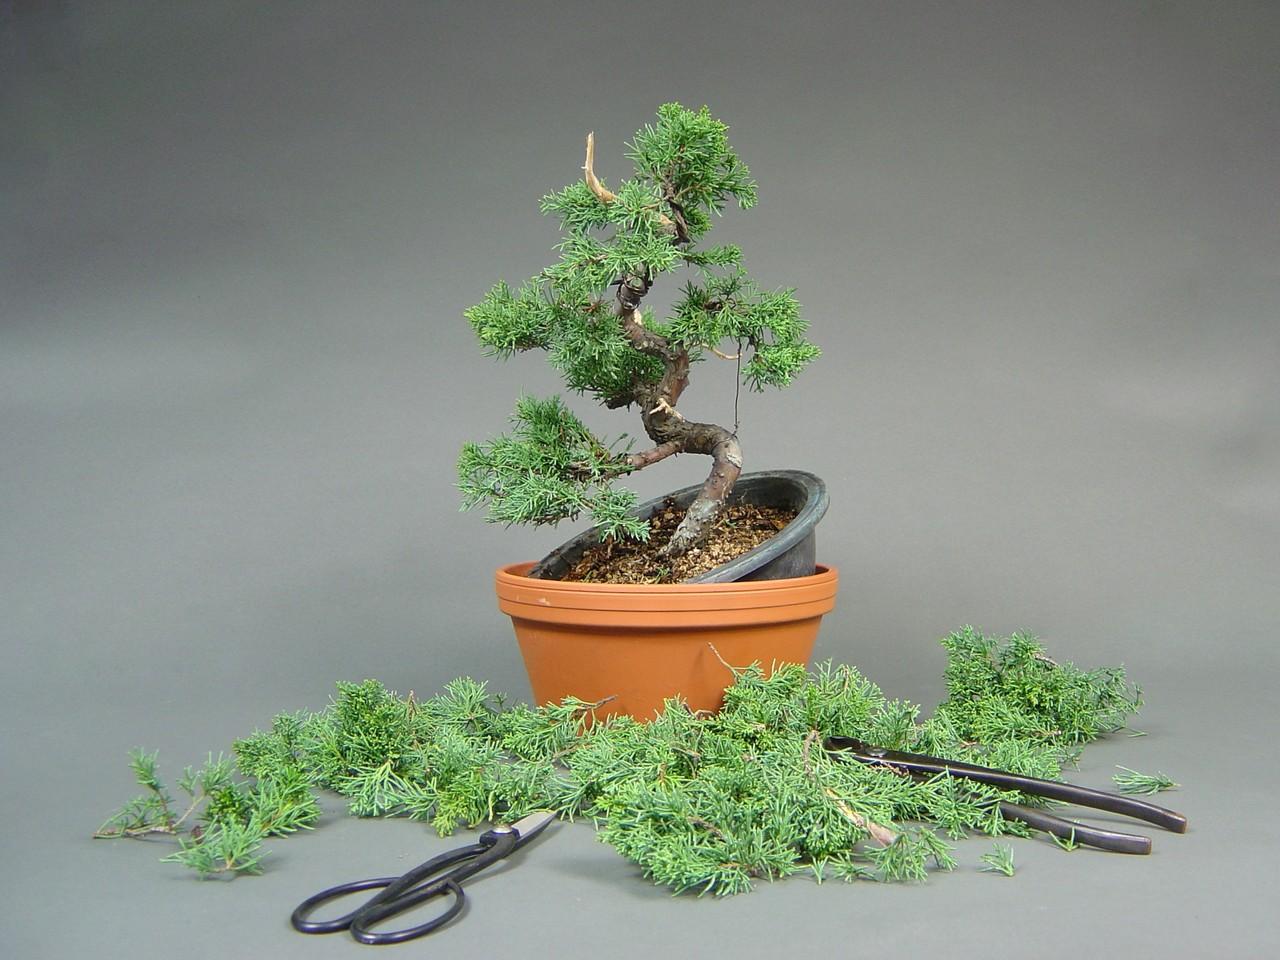 Bonsai Baum Pflege Indoor Bonsai Baum Pflege Bonsai Als Geschenk